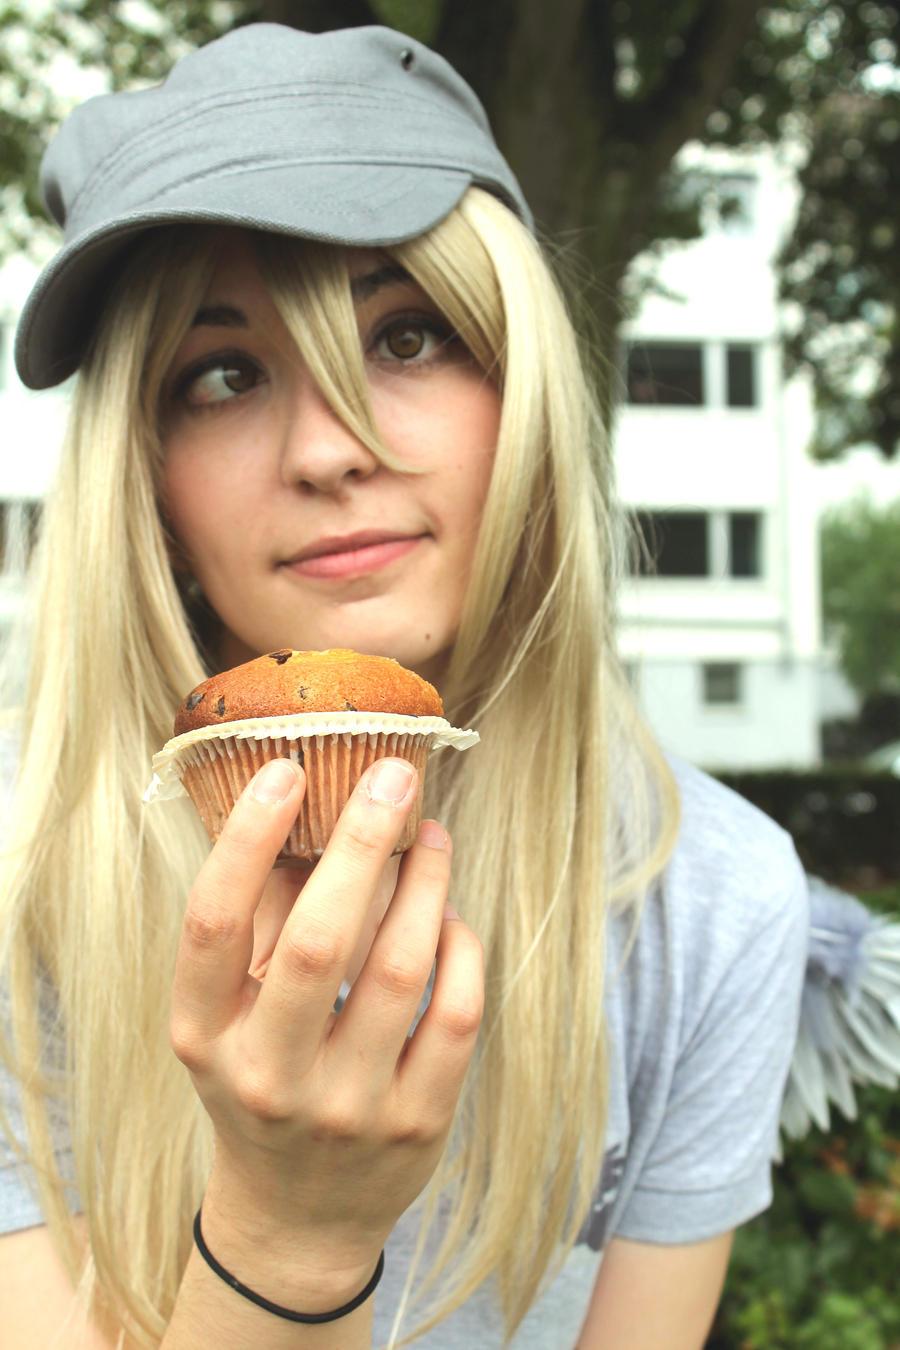 Muffin? by shinshiphen